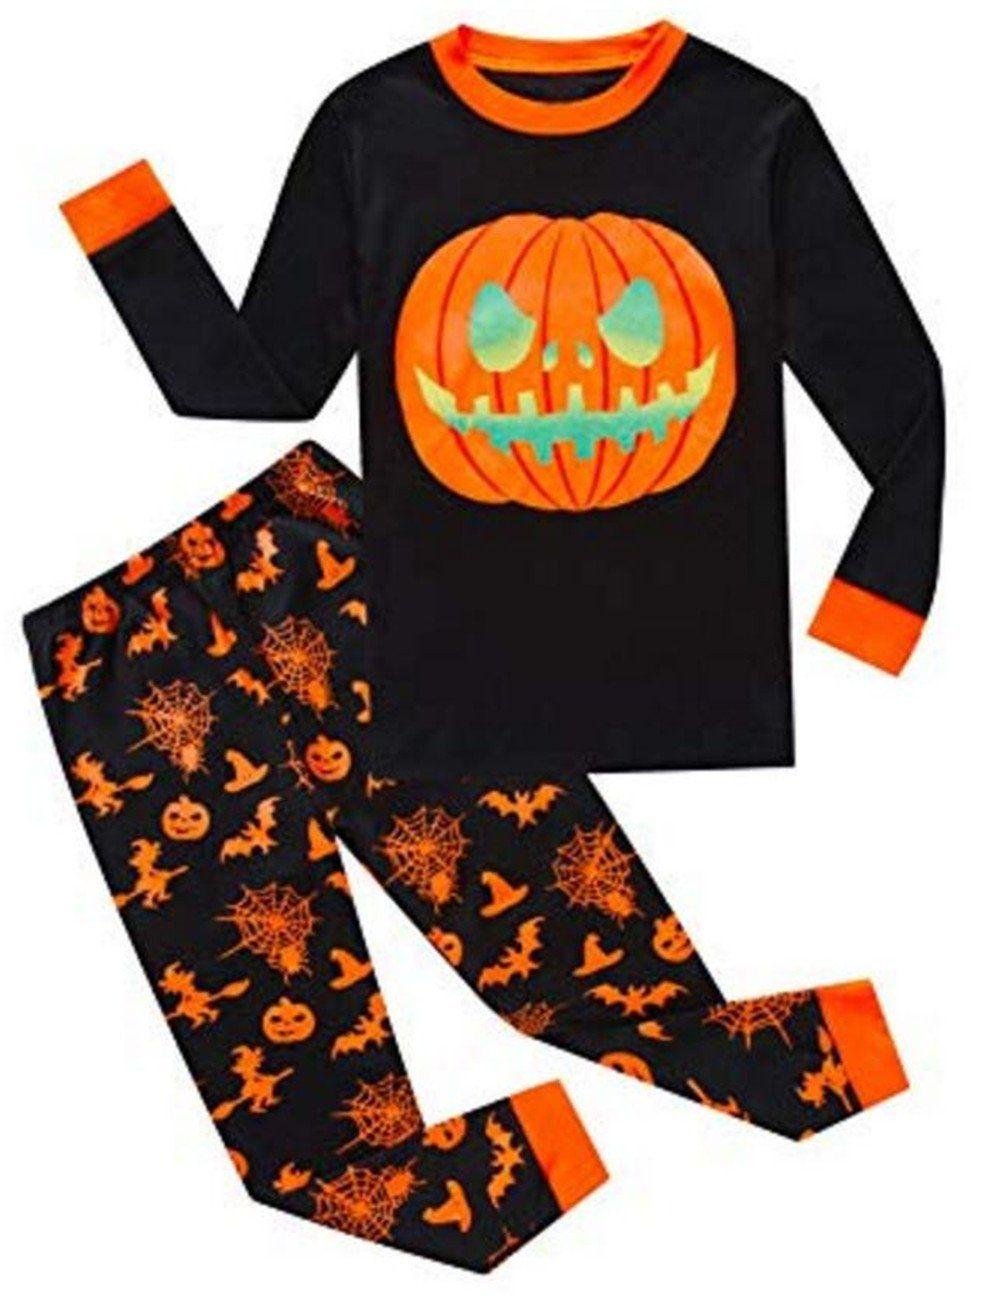 cdc0afbf Baby Boys Girls Pumpkin Print Long Sleeve T Shirt Tops Pants Halloween  Pajamas Set Size 4T Black ** Click photo to evaluate even more details.